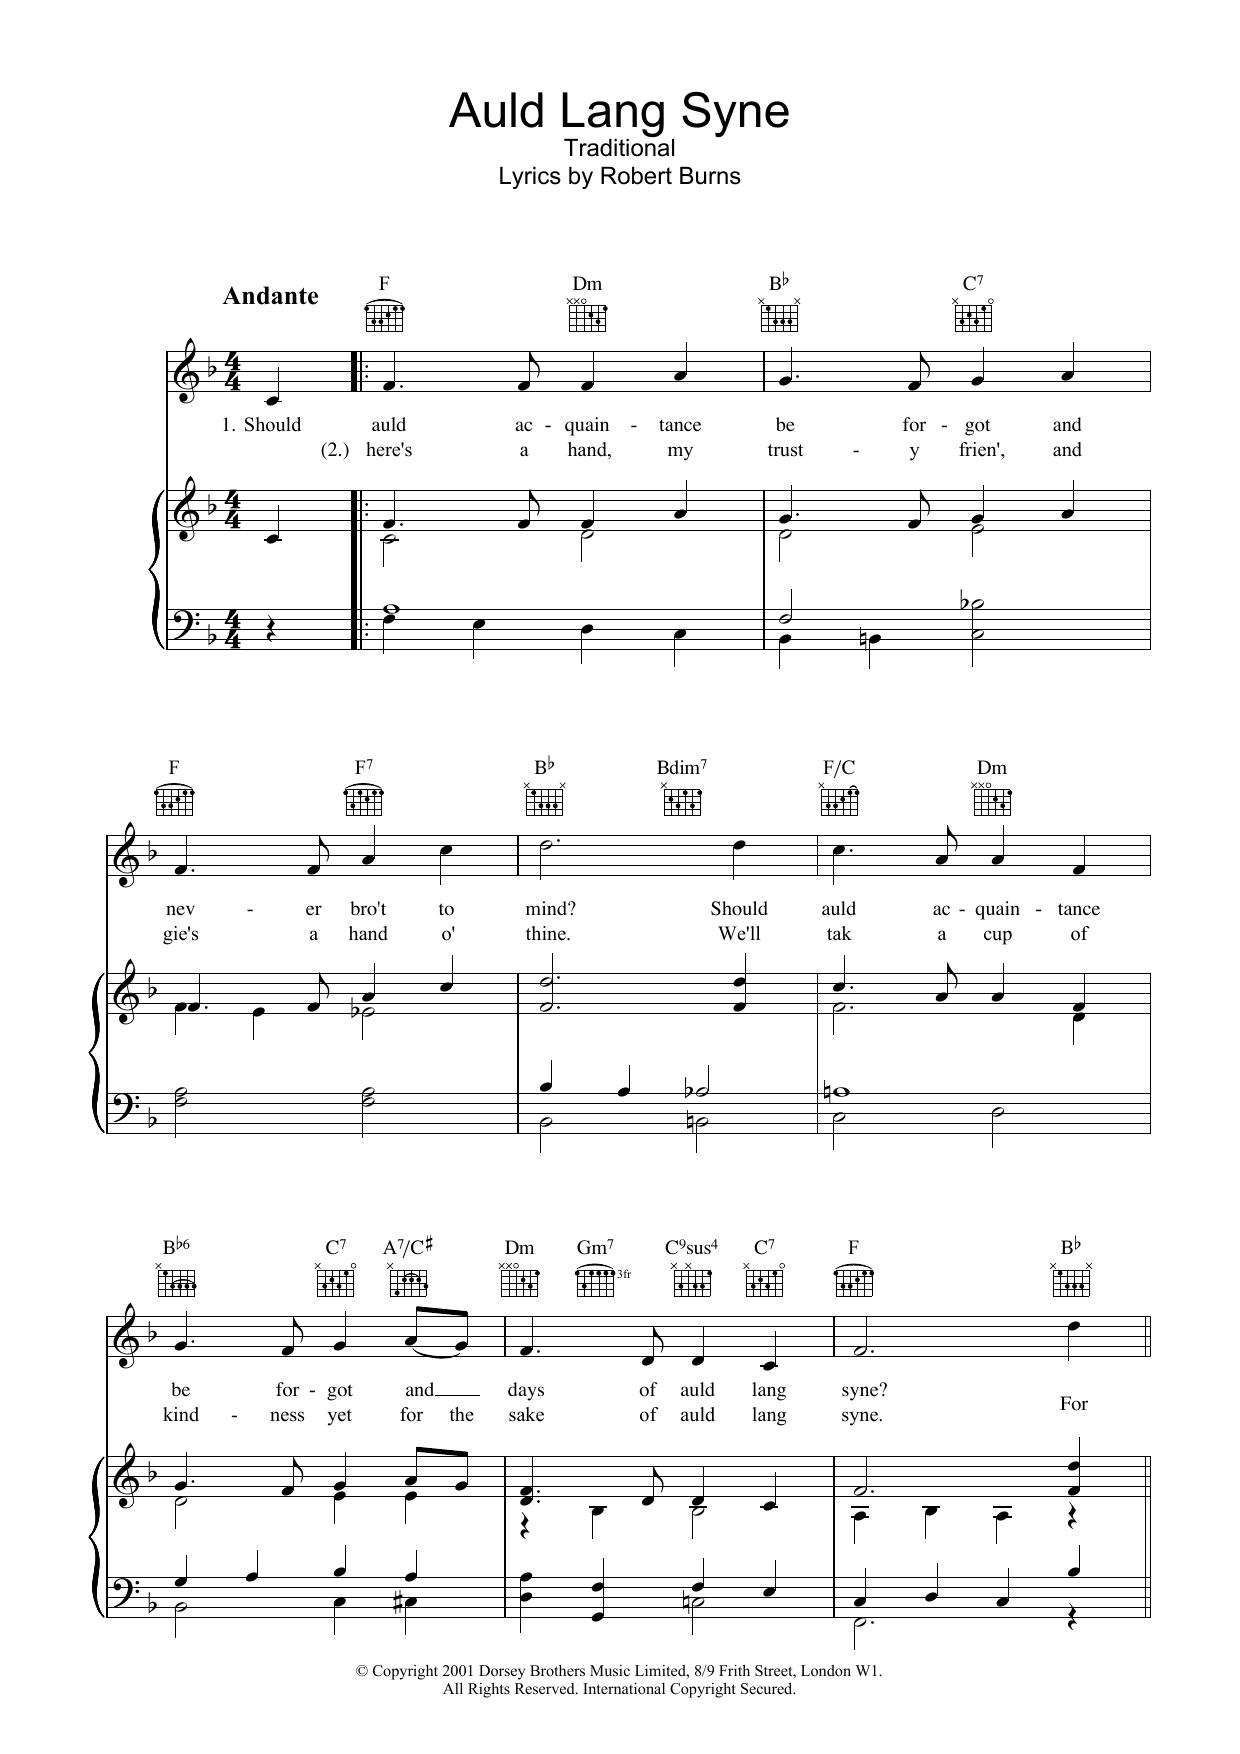 Robert Burns - Auld Lang Syne